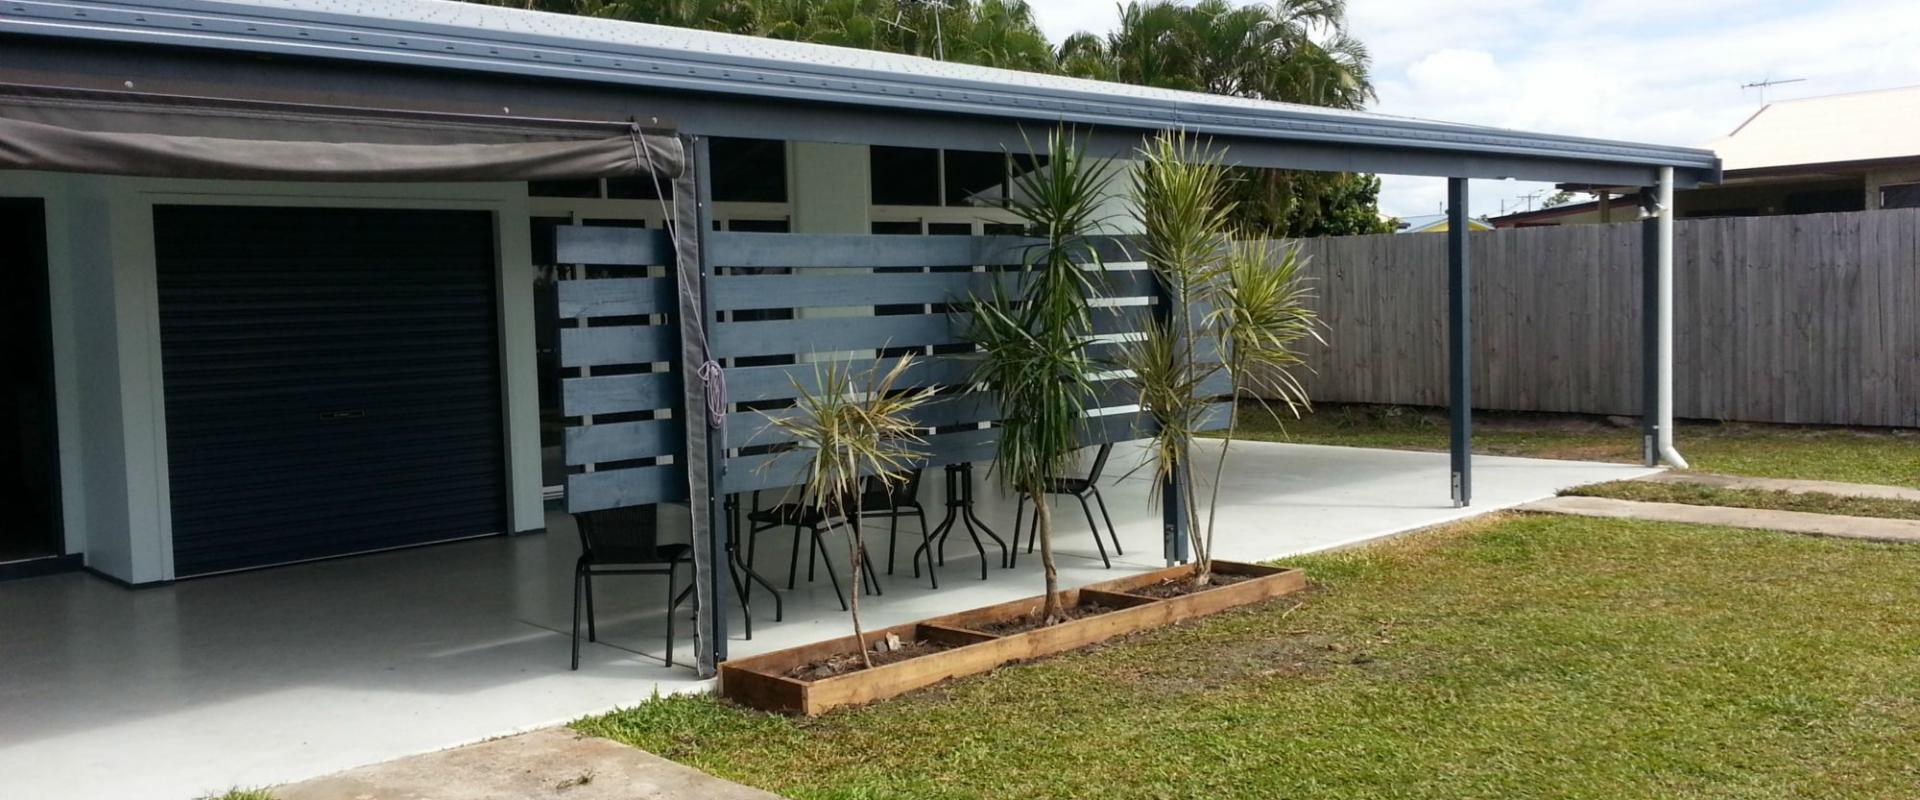 Kurrimine Beach Property Sales Easy Care 2 Bedroom Fully Air Con House